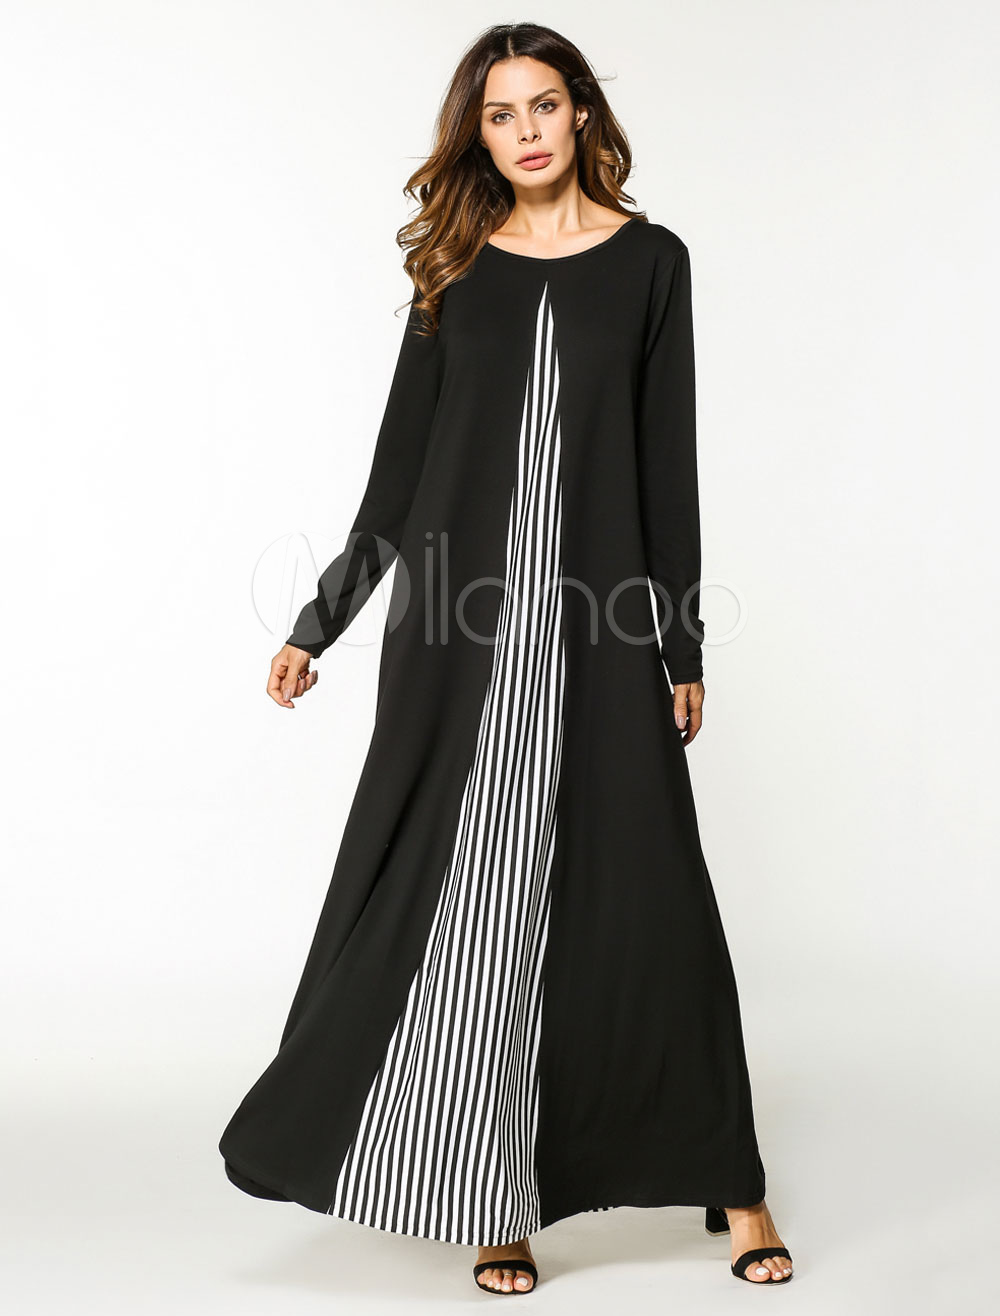 Muslim Black Abaya Dress Oversized Stripe Long Sleeve Women Maxi Kaftan Dress (Women\\'s Clothing Arabian Clothing) photo